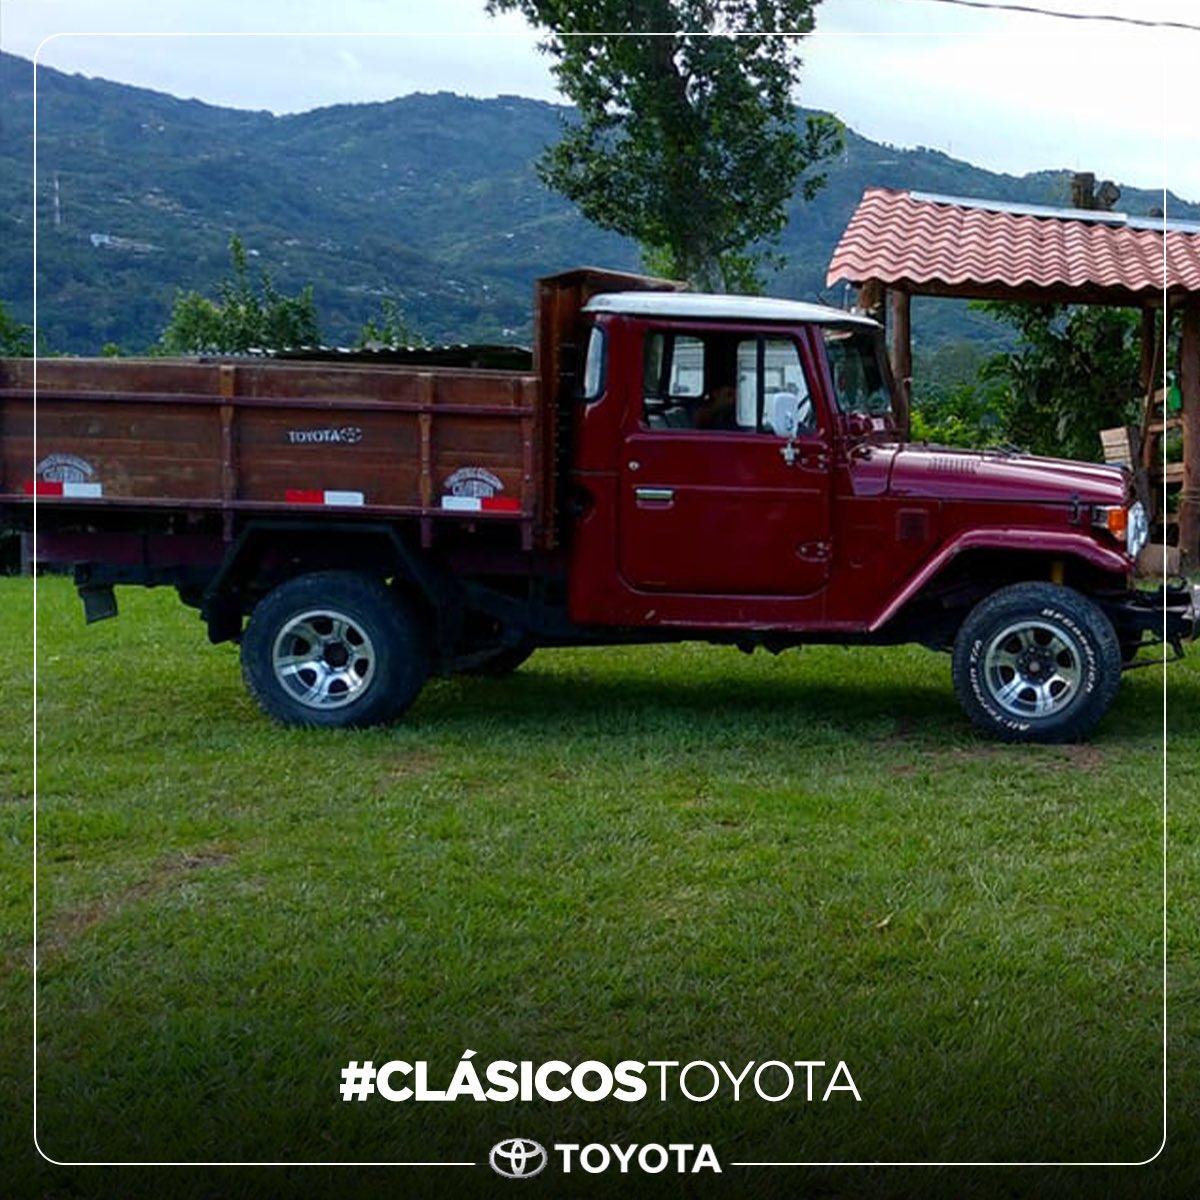 """Lo mejor que existe""  📸Jefferson Jiménez Retana.  #toyota #landcruiser #clasicostoyota #tbt https://t.co/vhzLj9io8d"